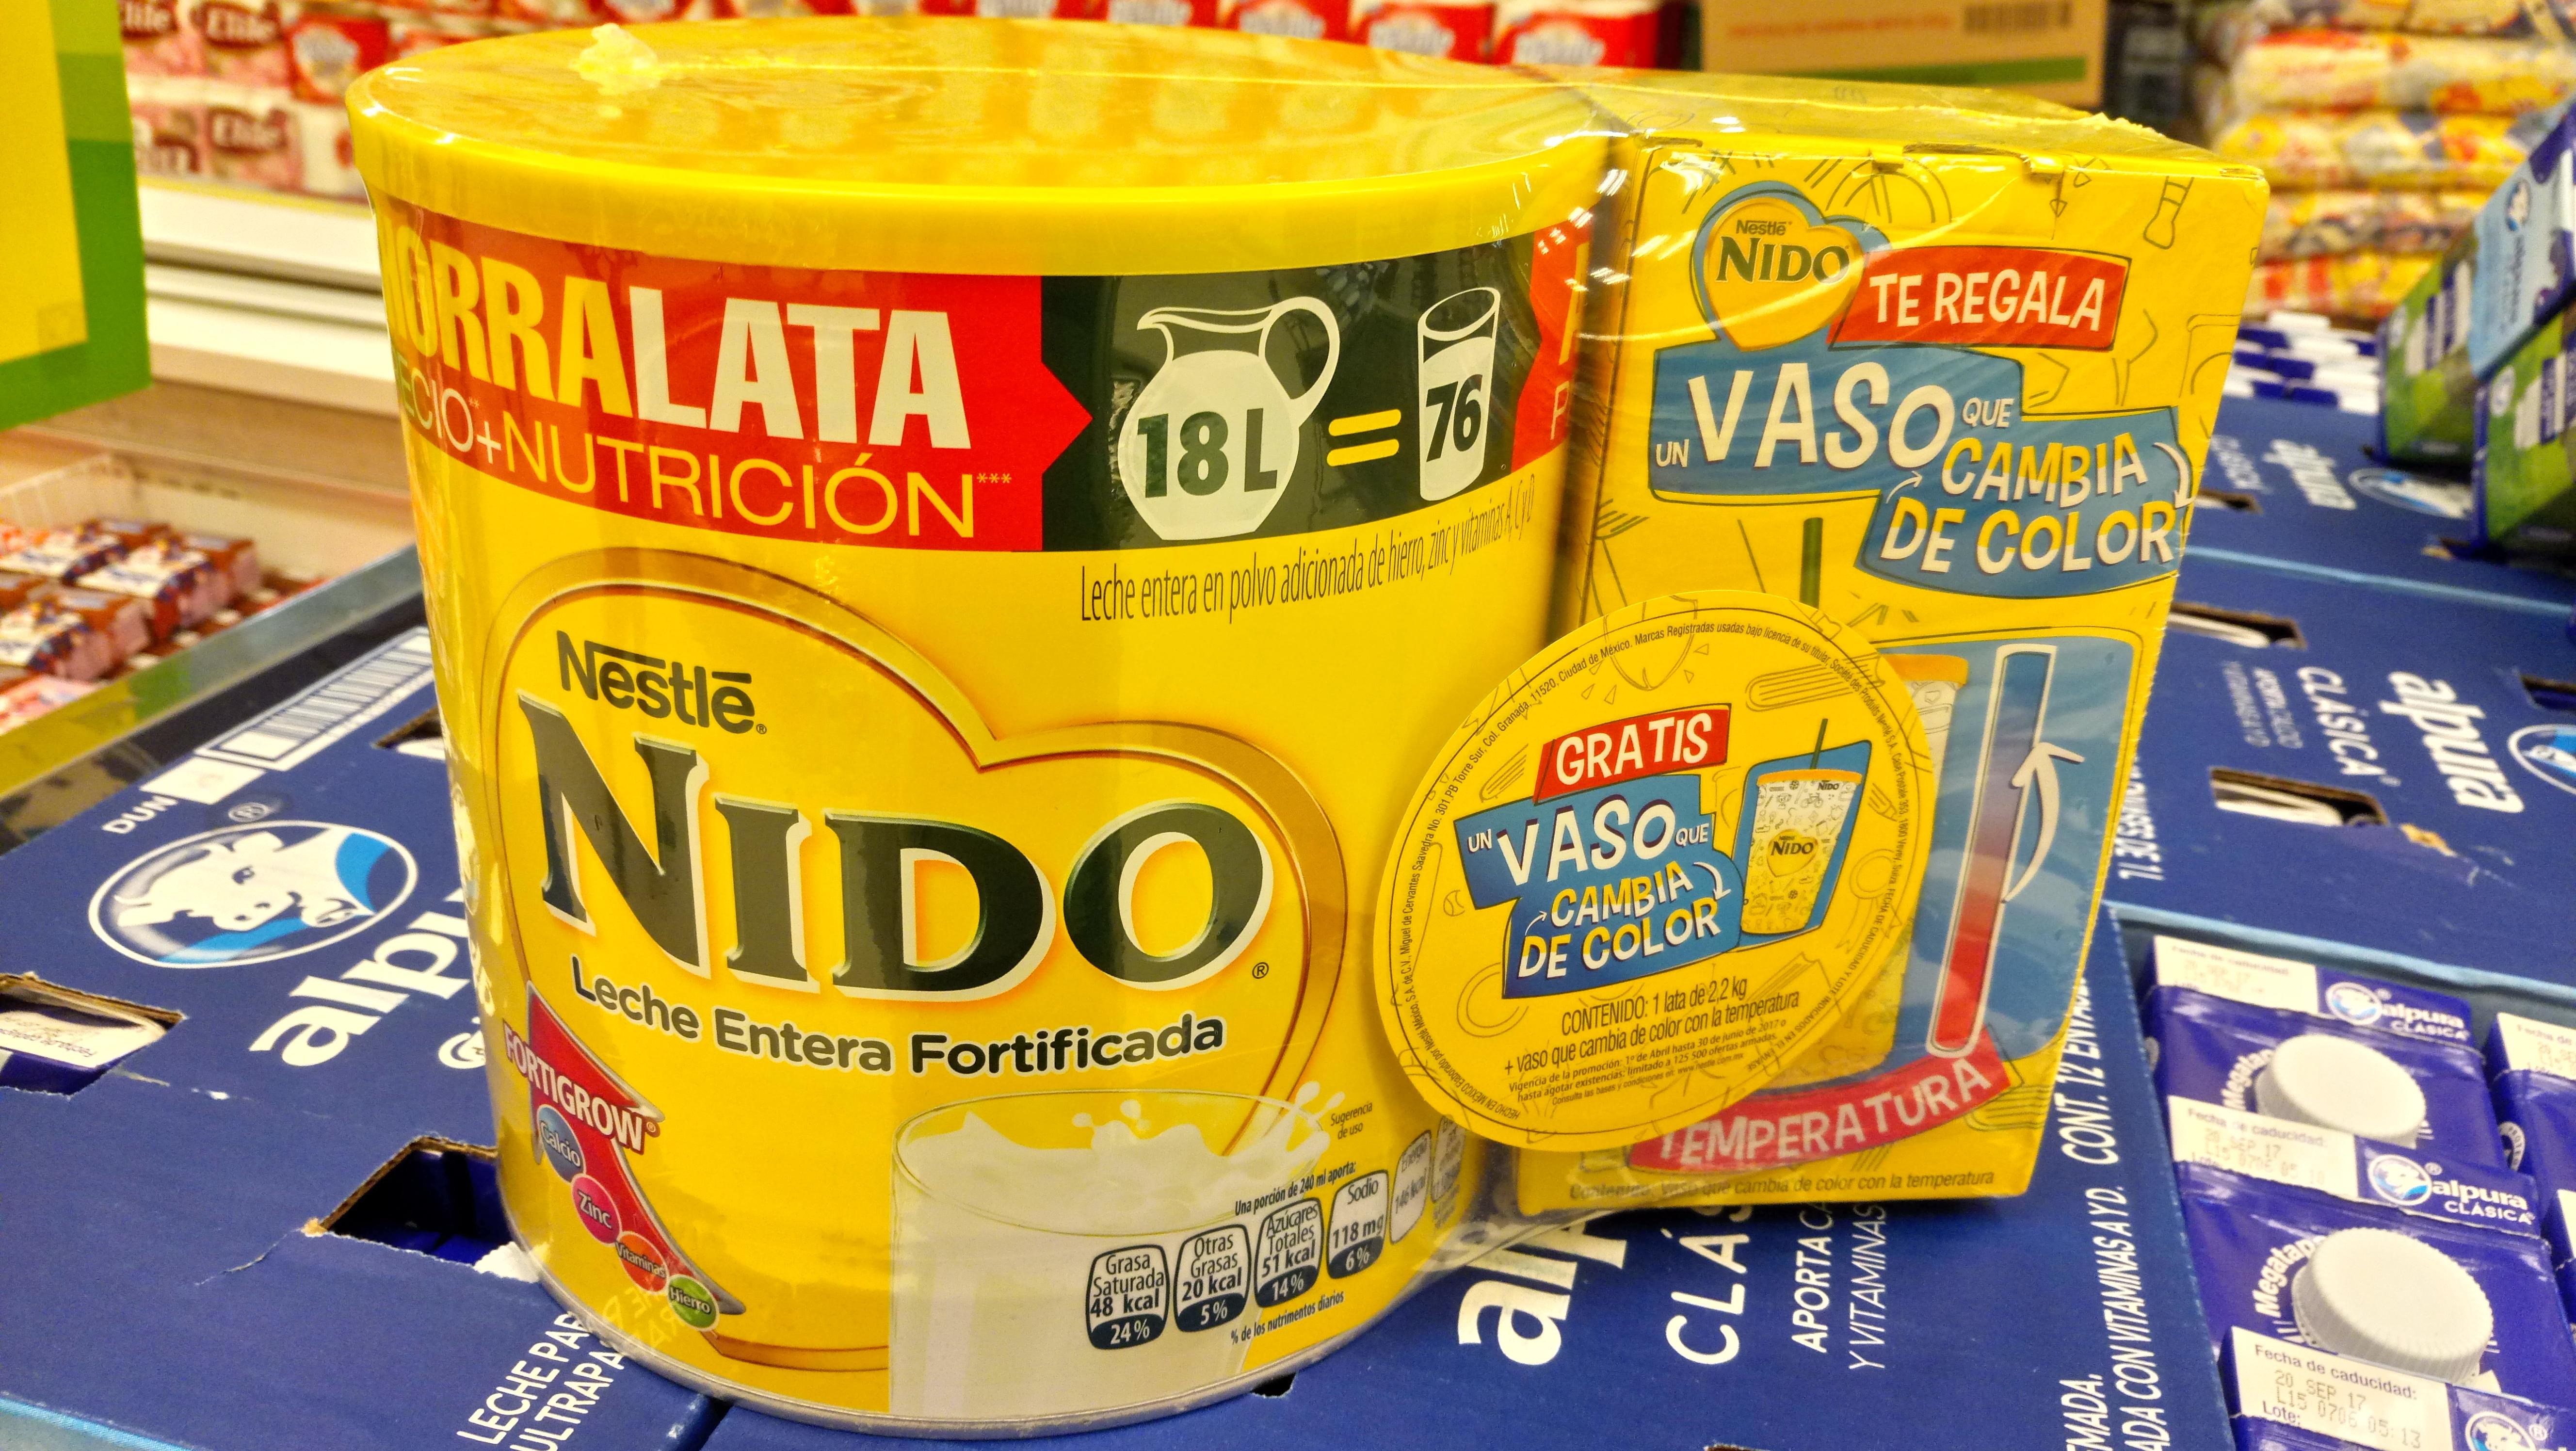 Soriana Hiper - Leche Nido Fortificada 2.2 kg +Vaso de regalo